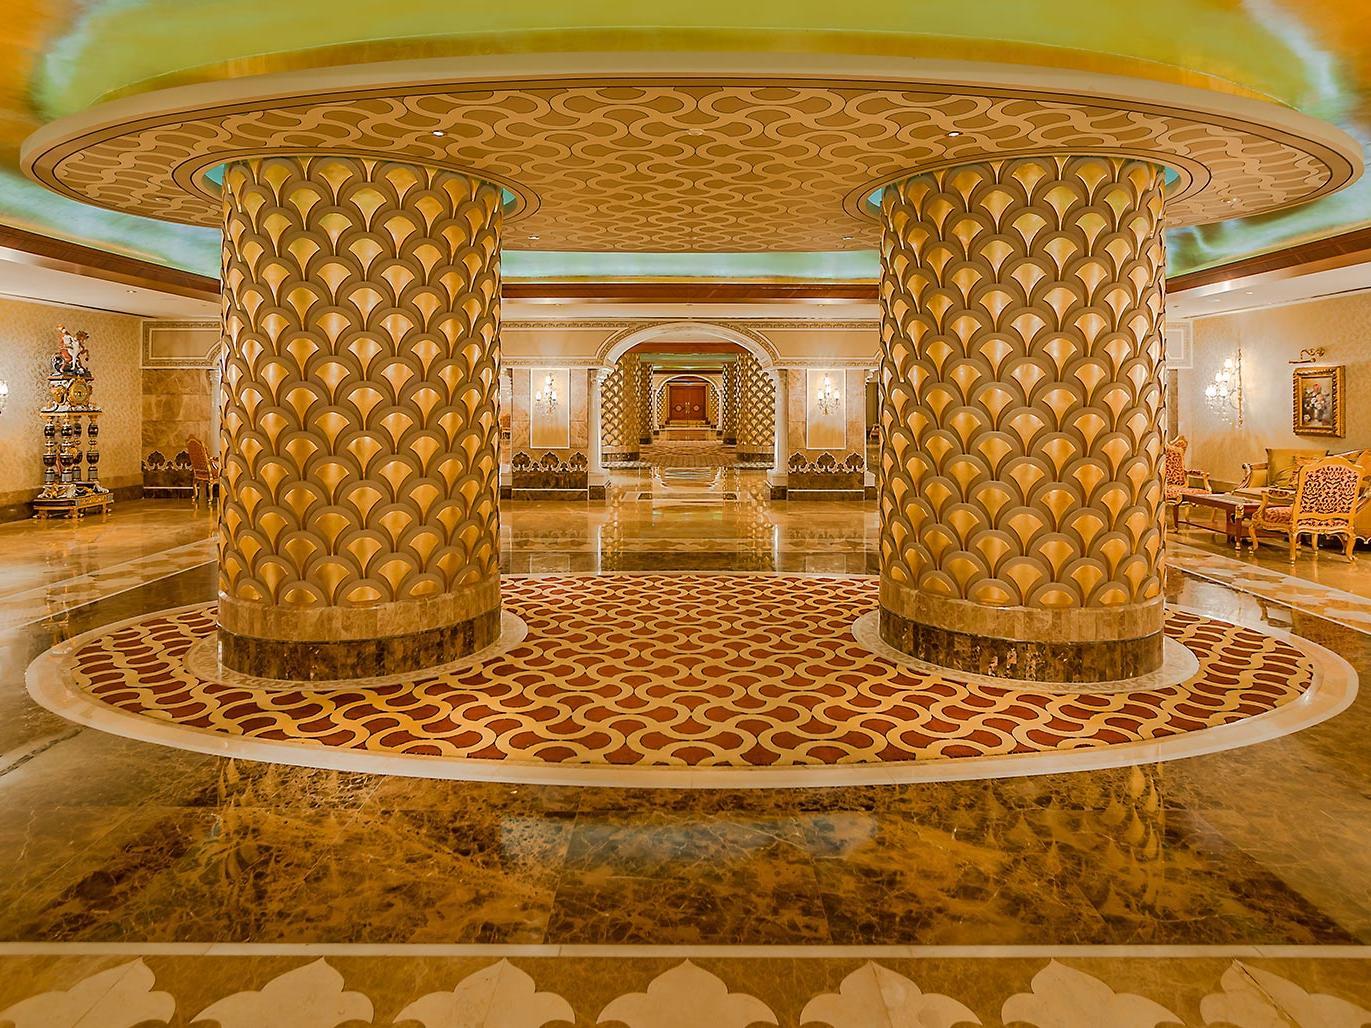 Mardanpalacehotel-Otel-Mermer-Dekorasyon- (7)